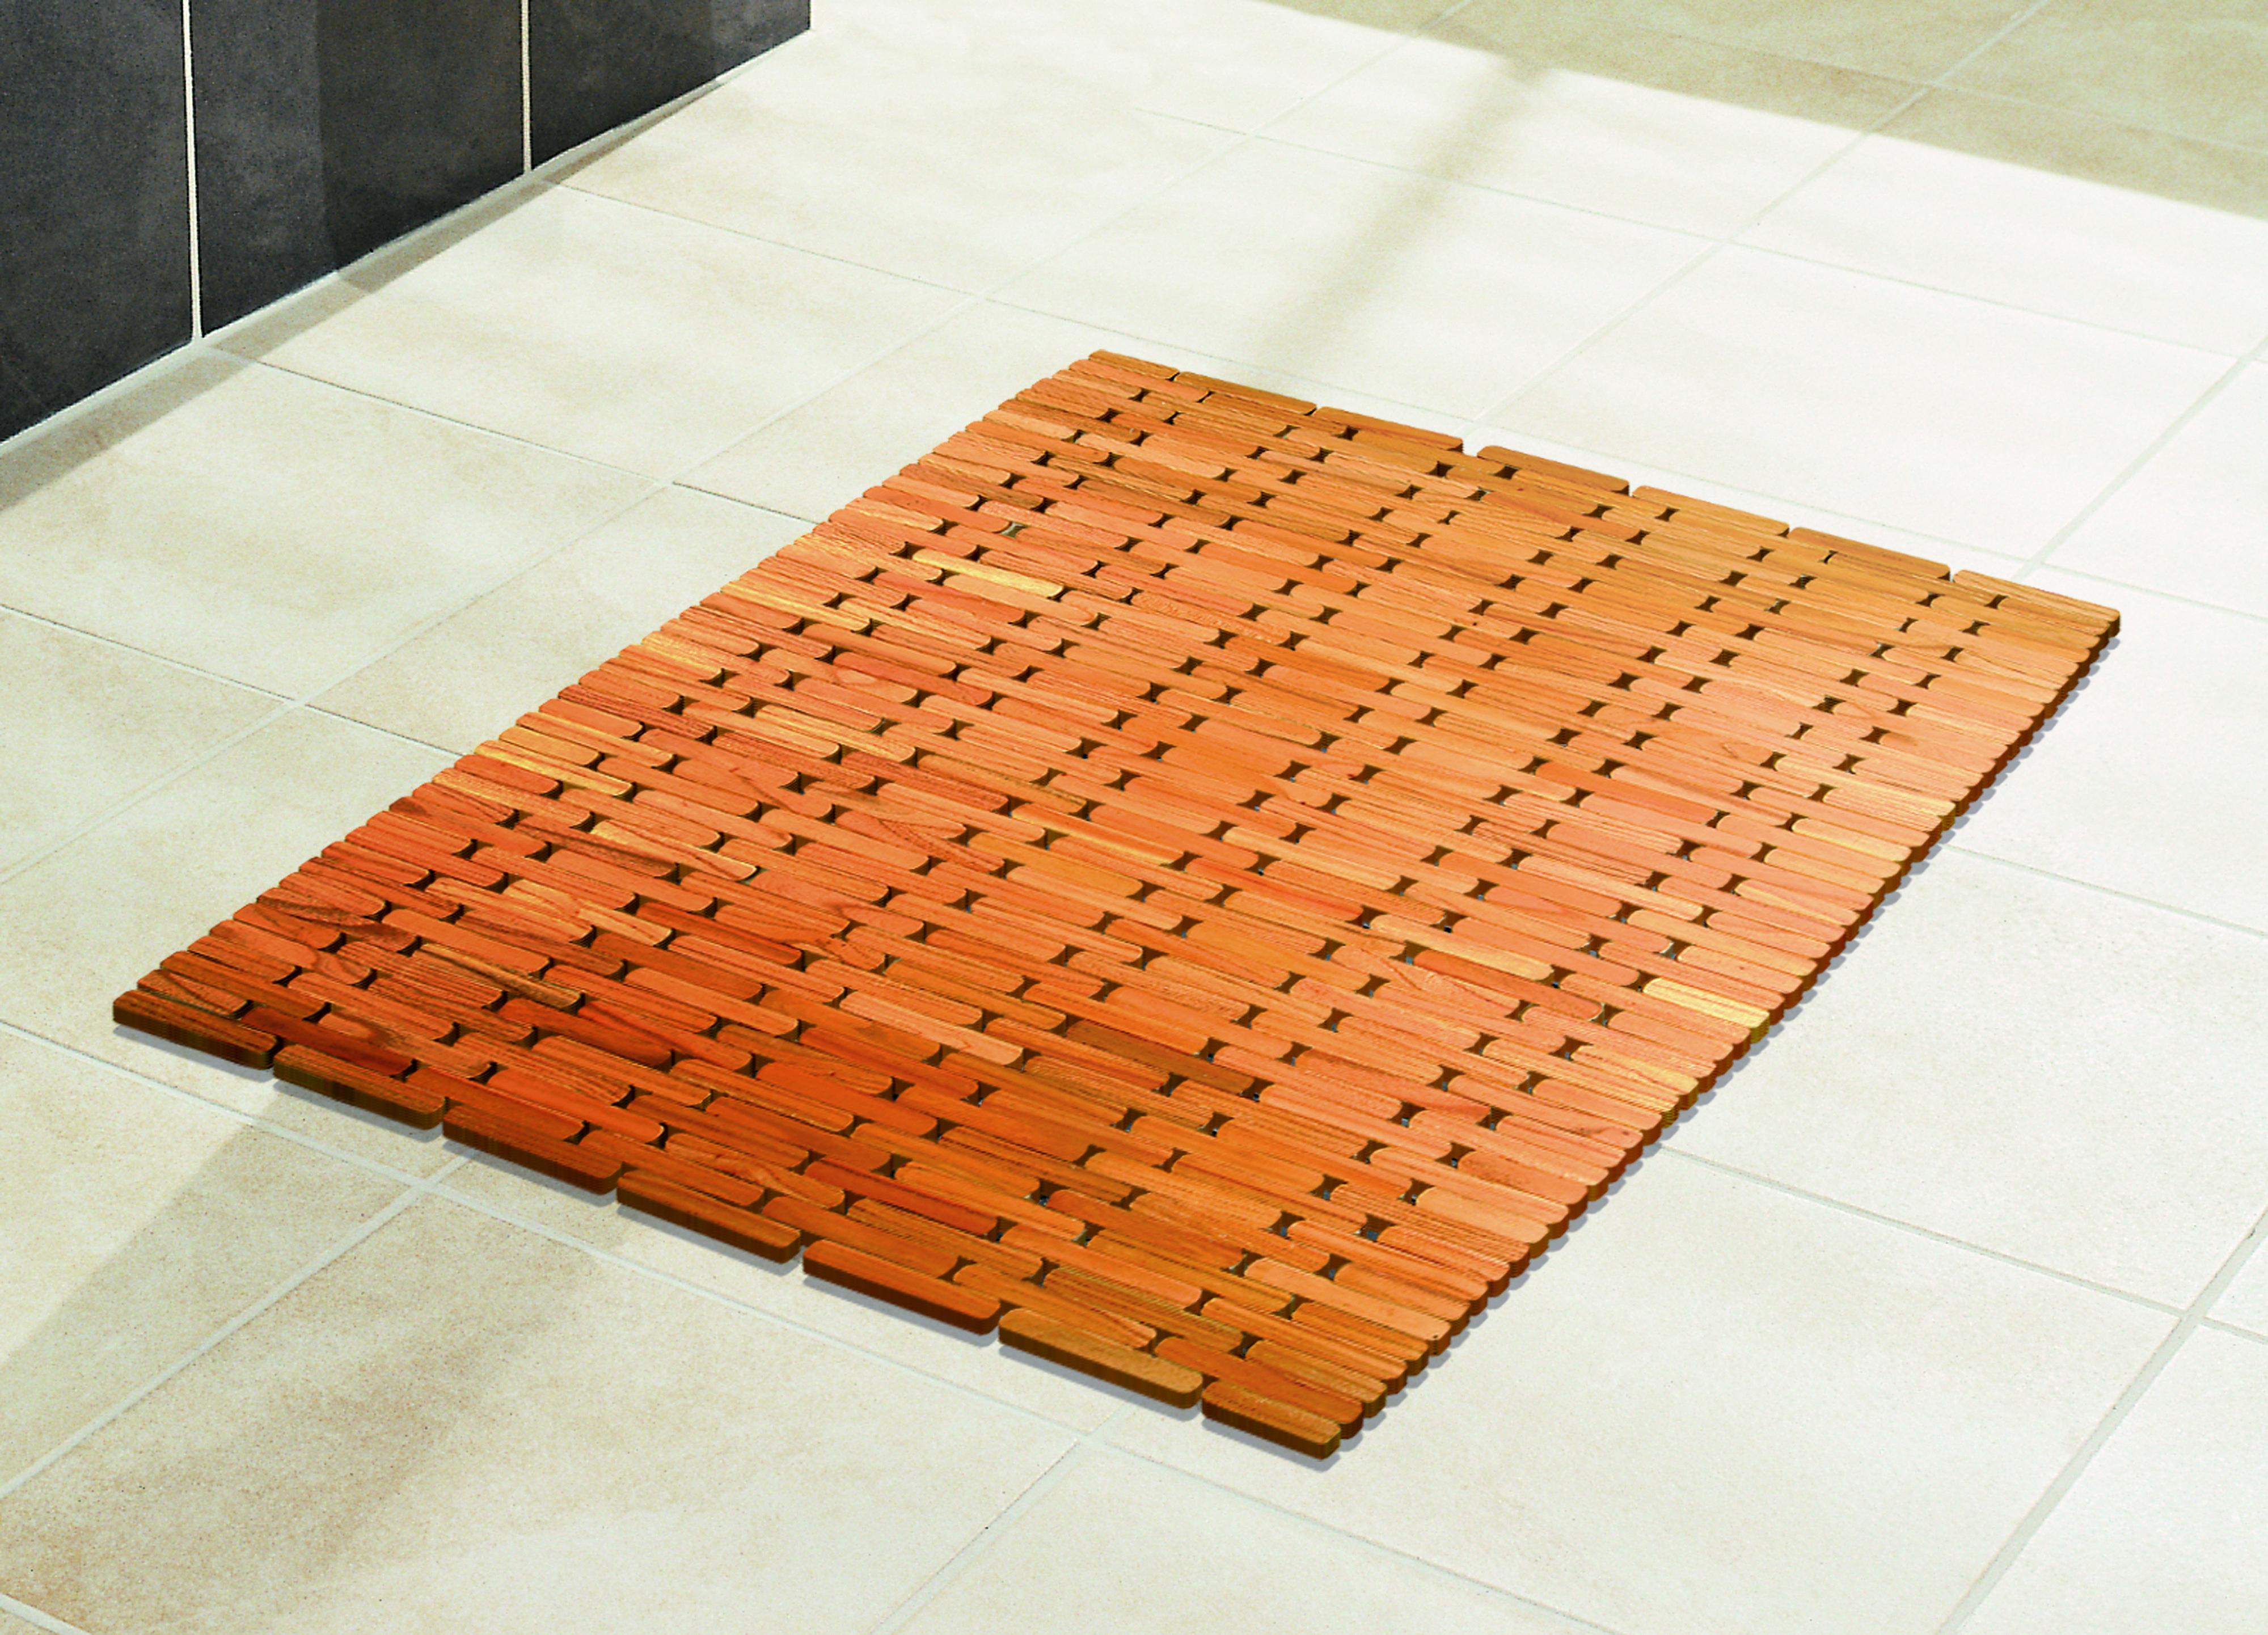 Bambusmatte Badezimmer ~ Badvorleger holz aus ullme in natur tranzparent lackiert